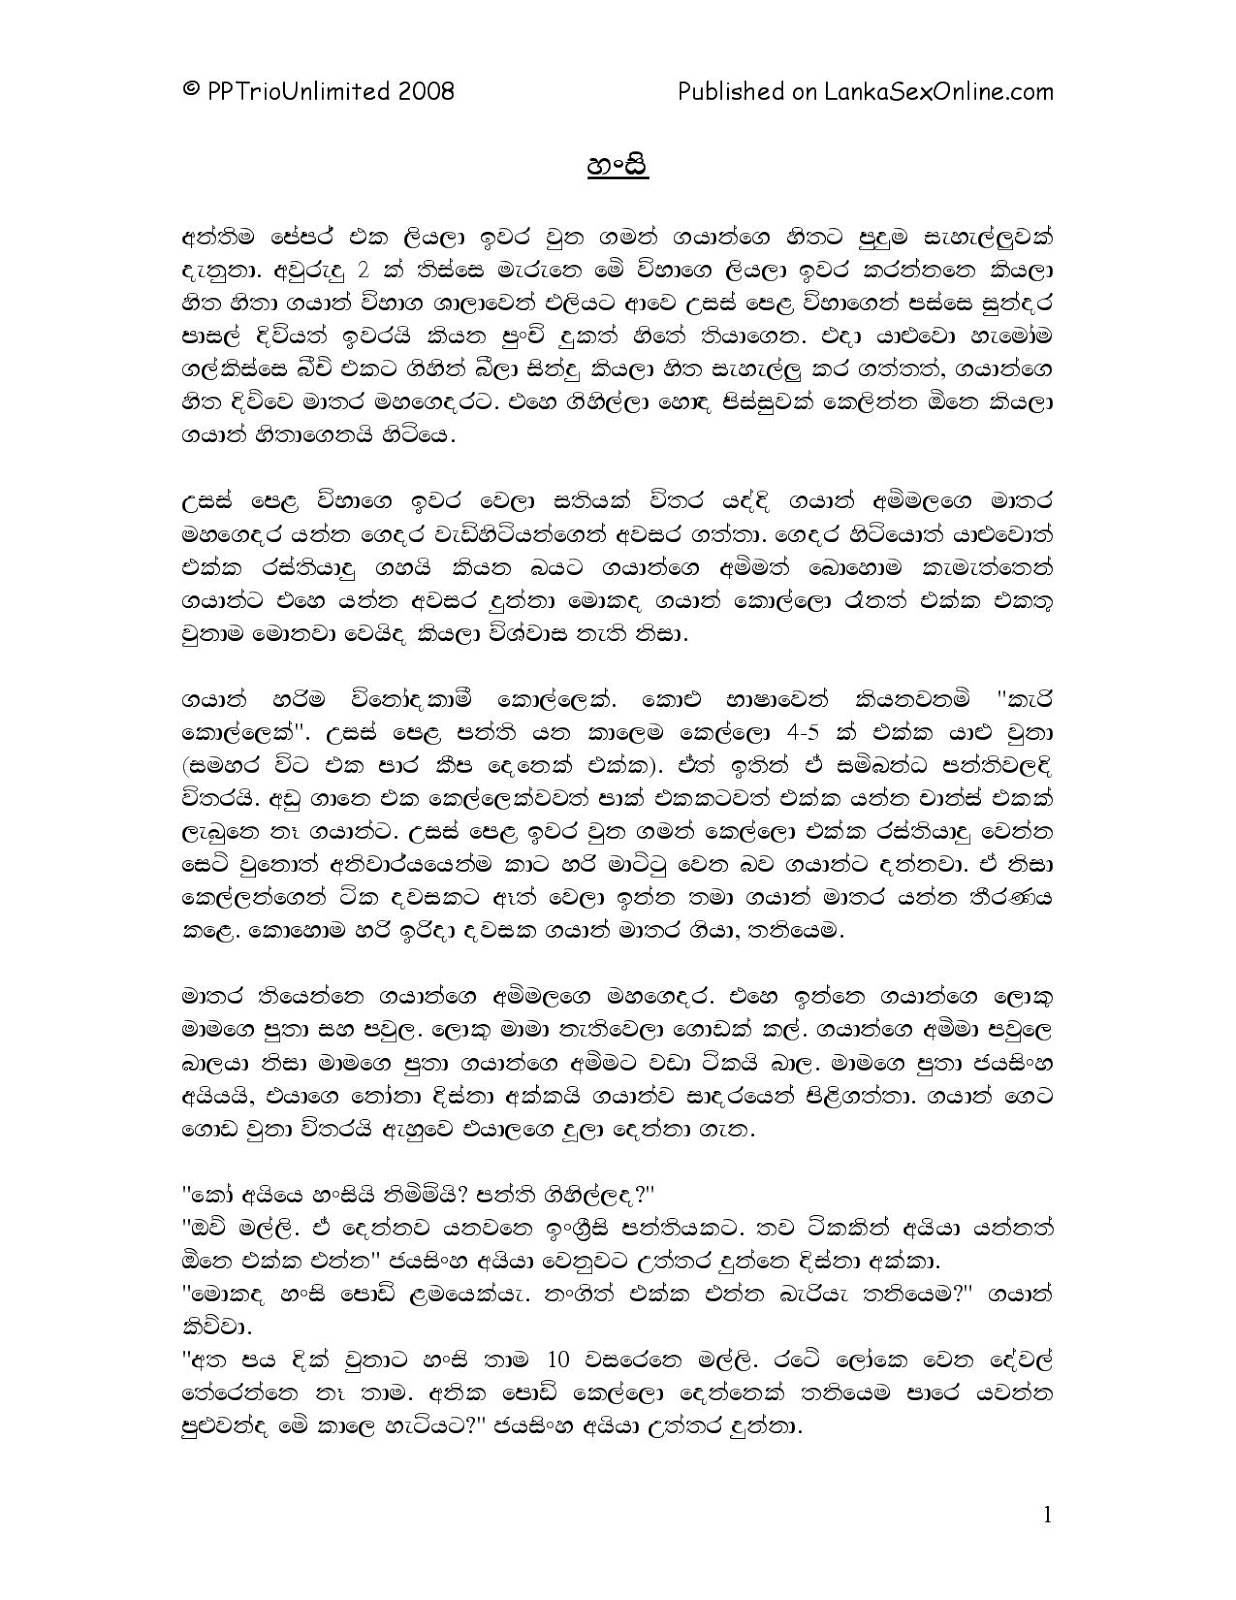 sinhala wal katha ammai mamai - totalresepi.blogspot.com